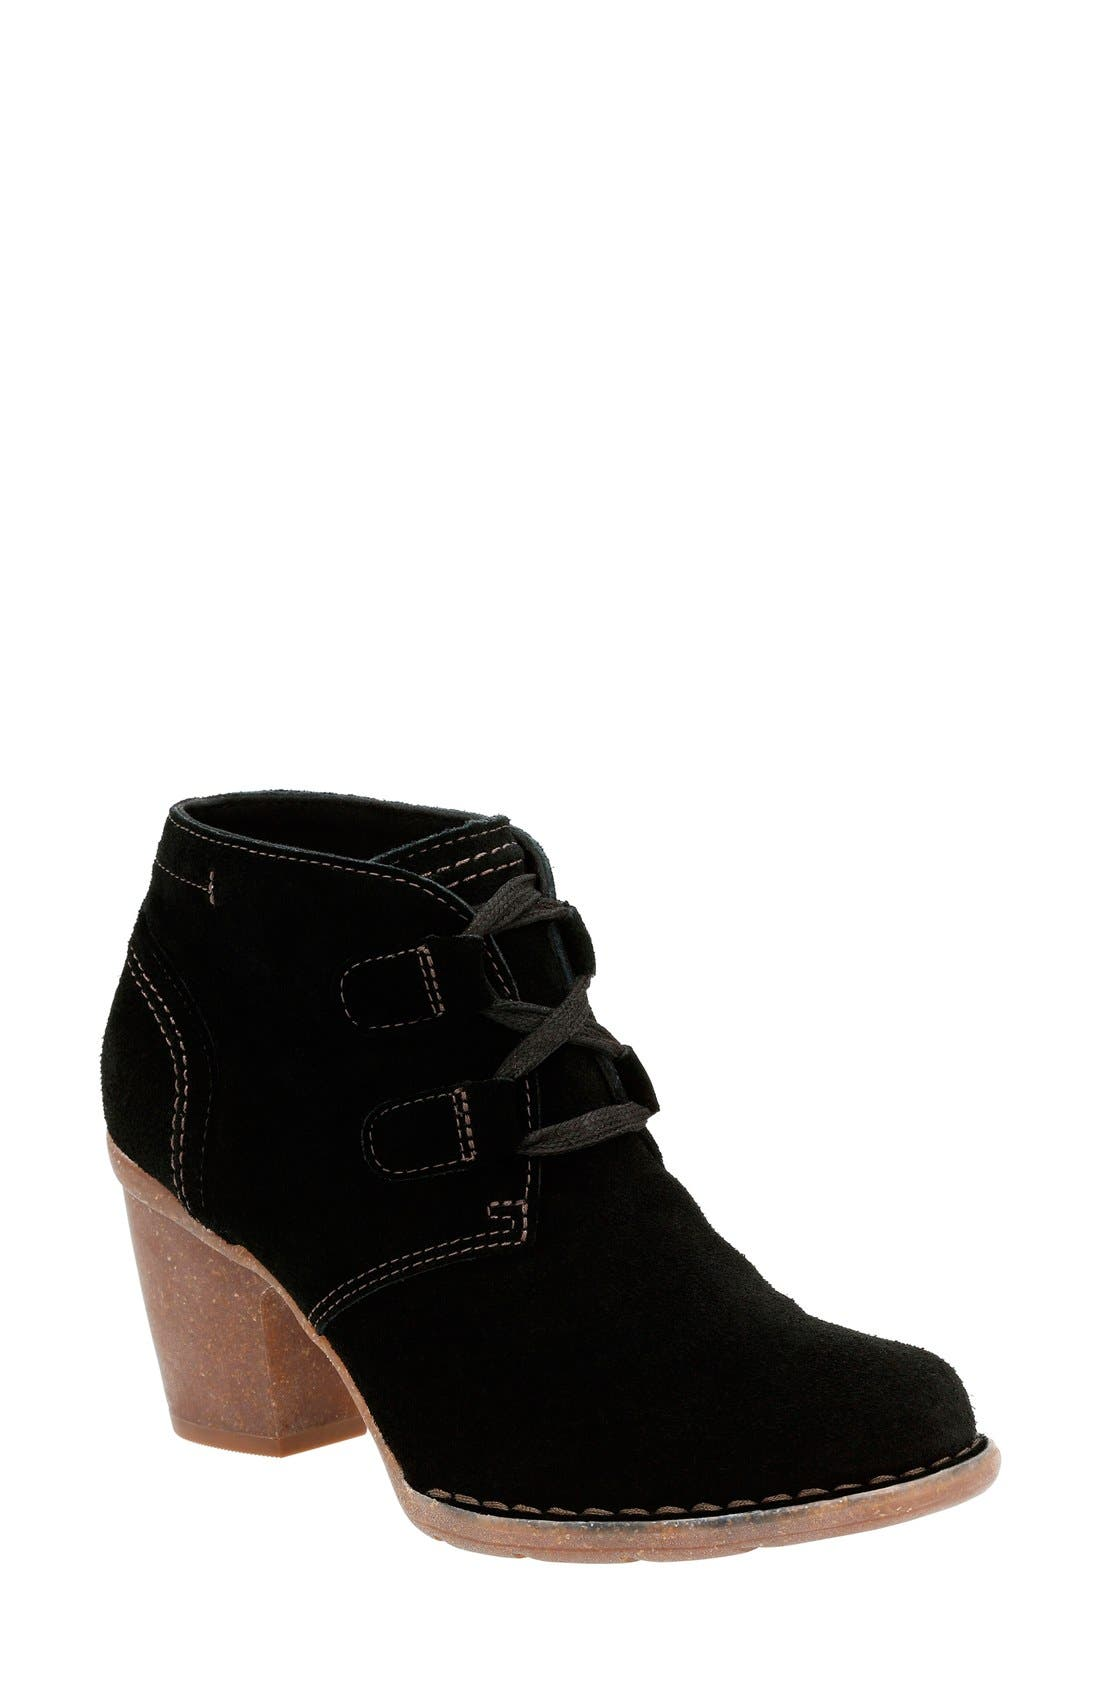 'Carleta Lyon' Ankle Boot,                             Main thumbnail 1, color,                             BLACK SUEDE